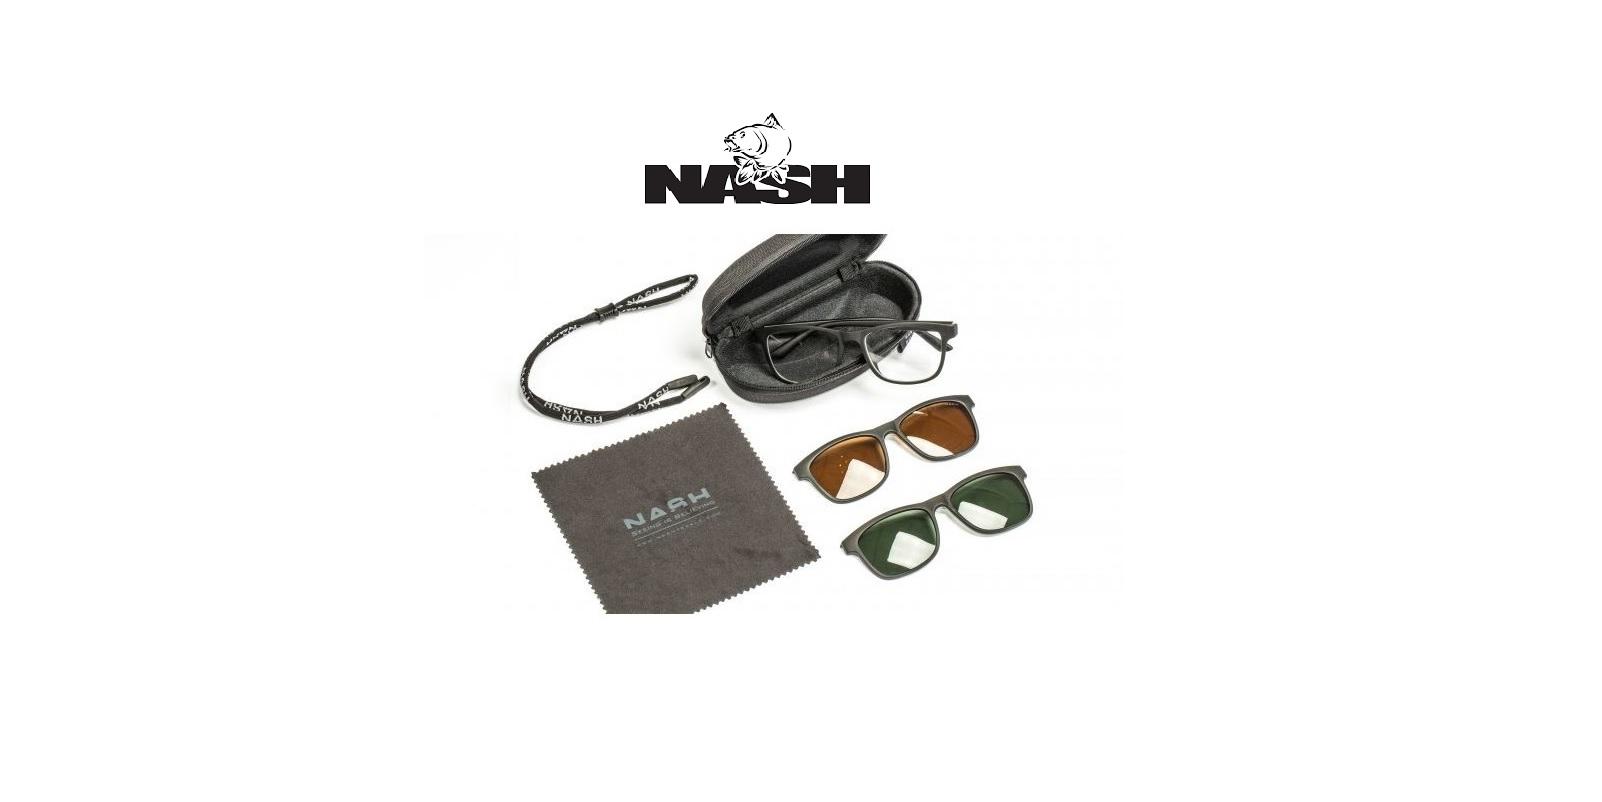 Occhiali da sole Nash Mag Optix Sunglasses cod C3005